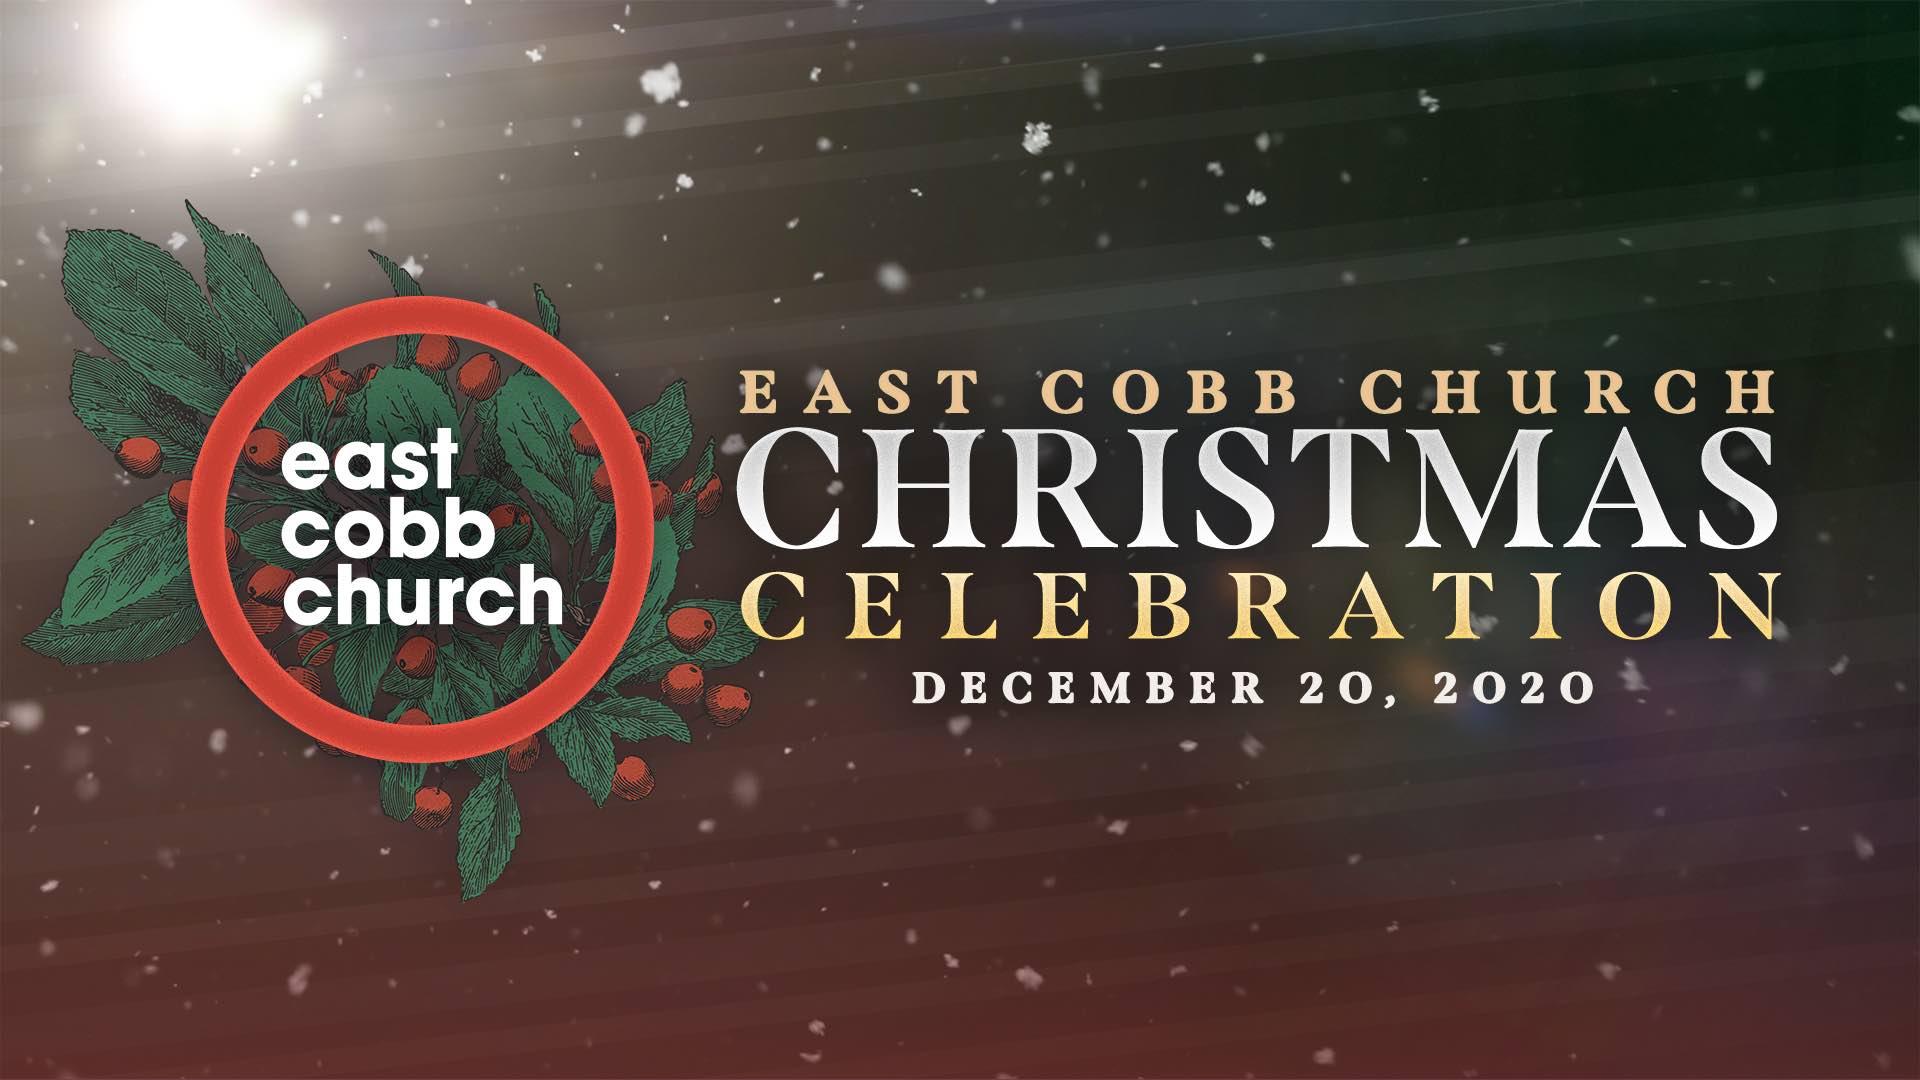 East Cobb Church Christmas Celebration